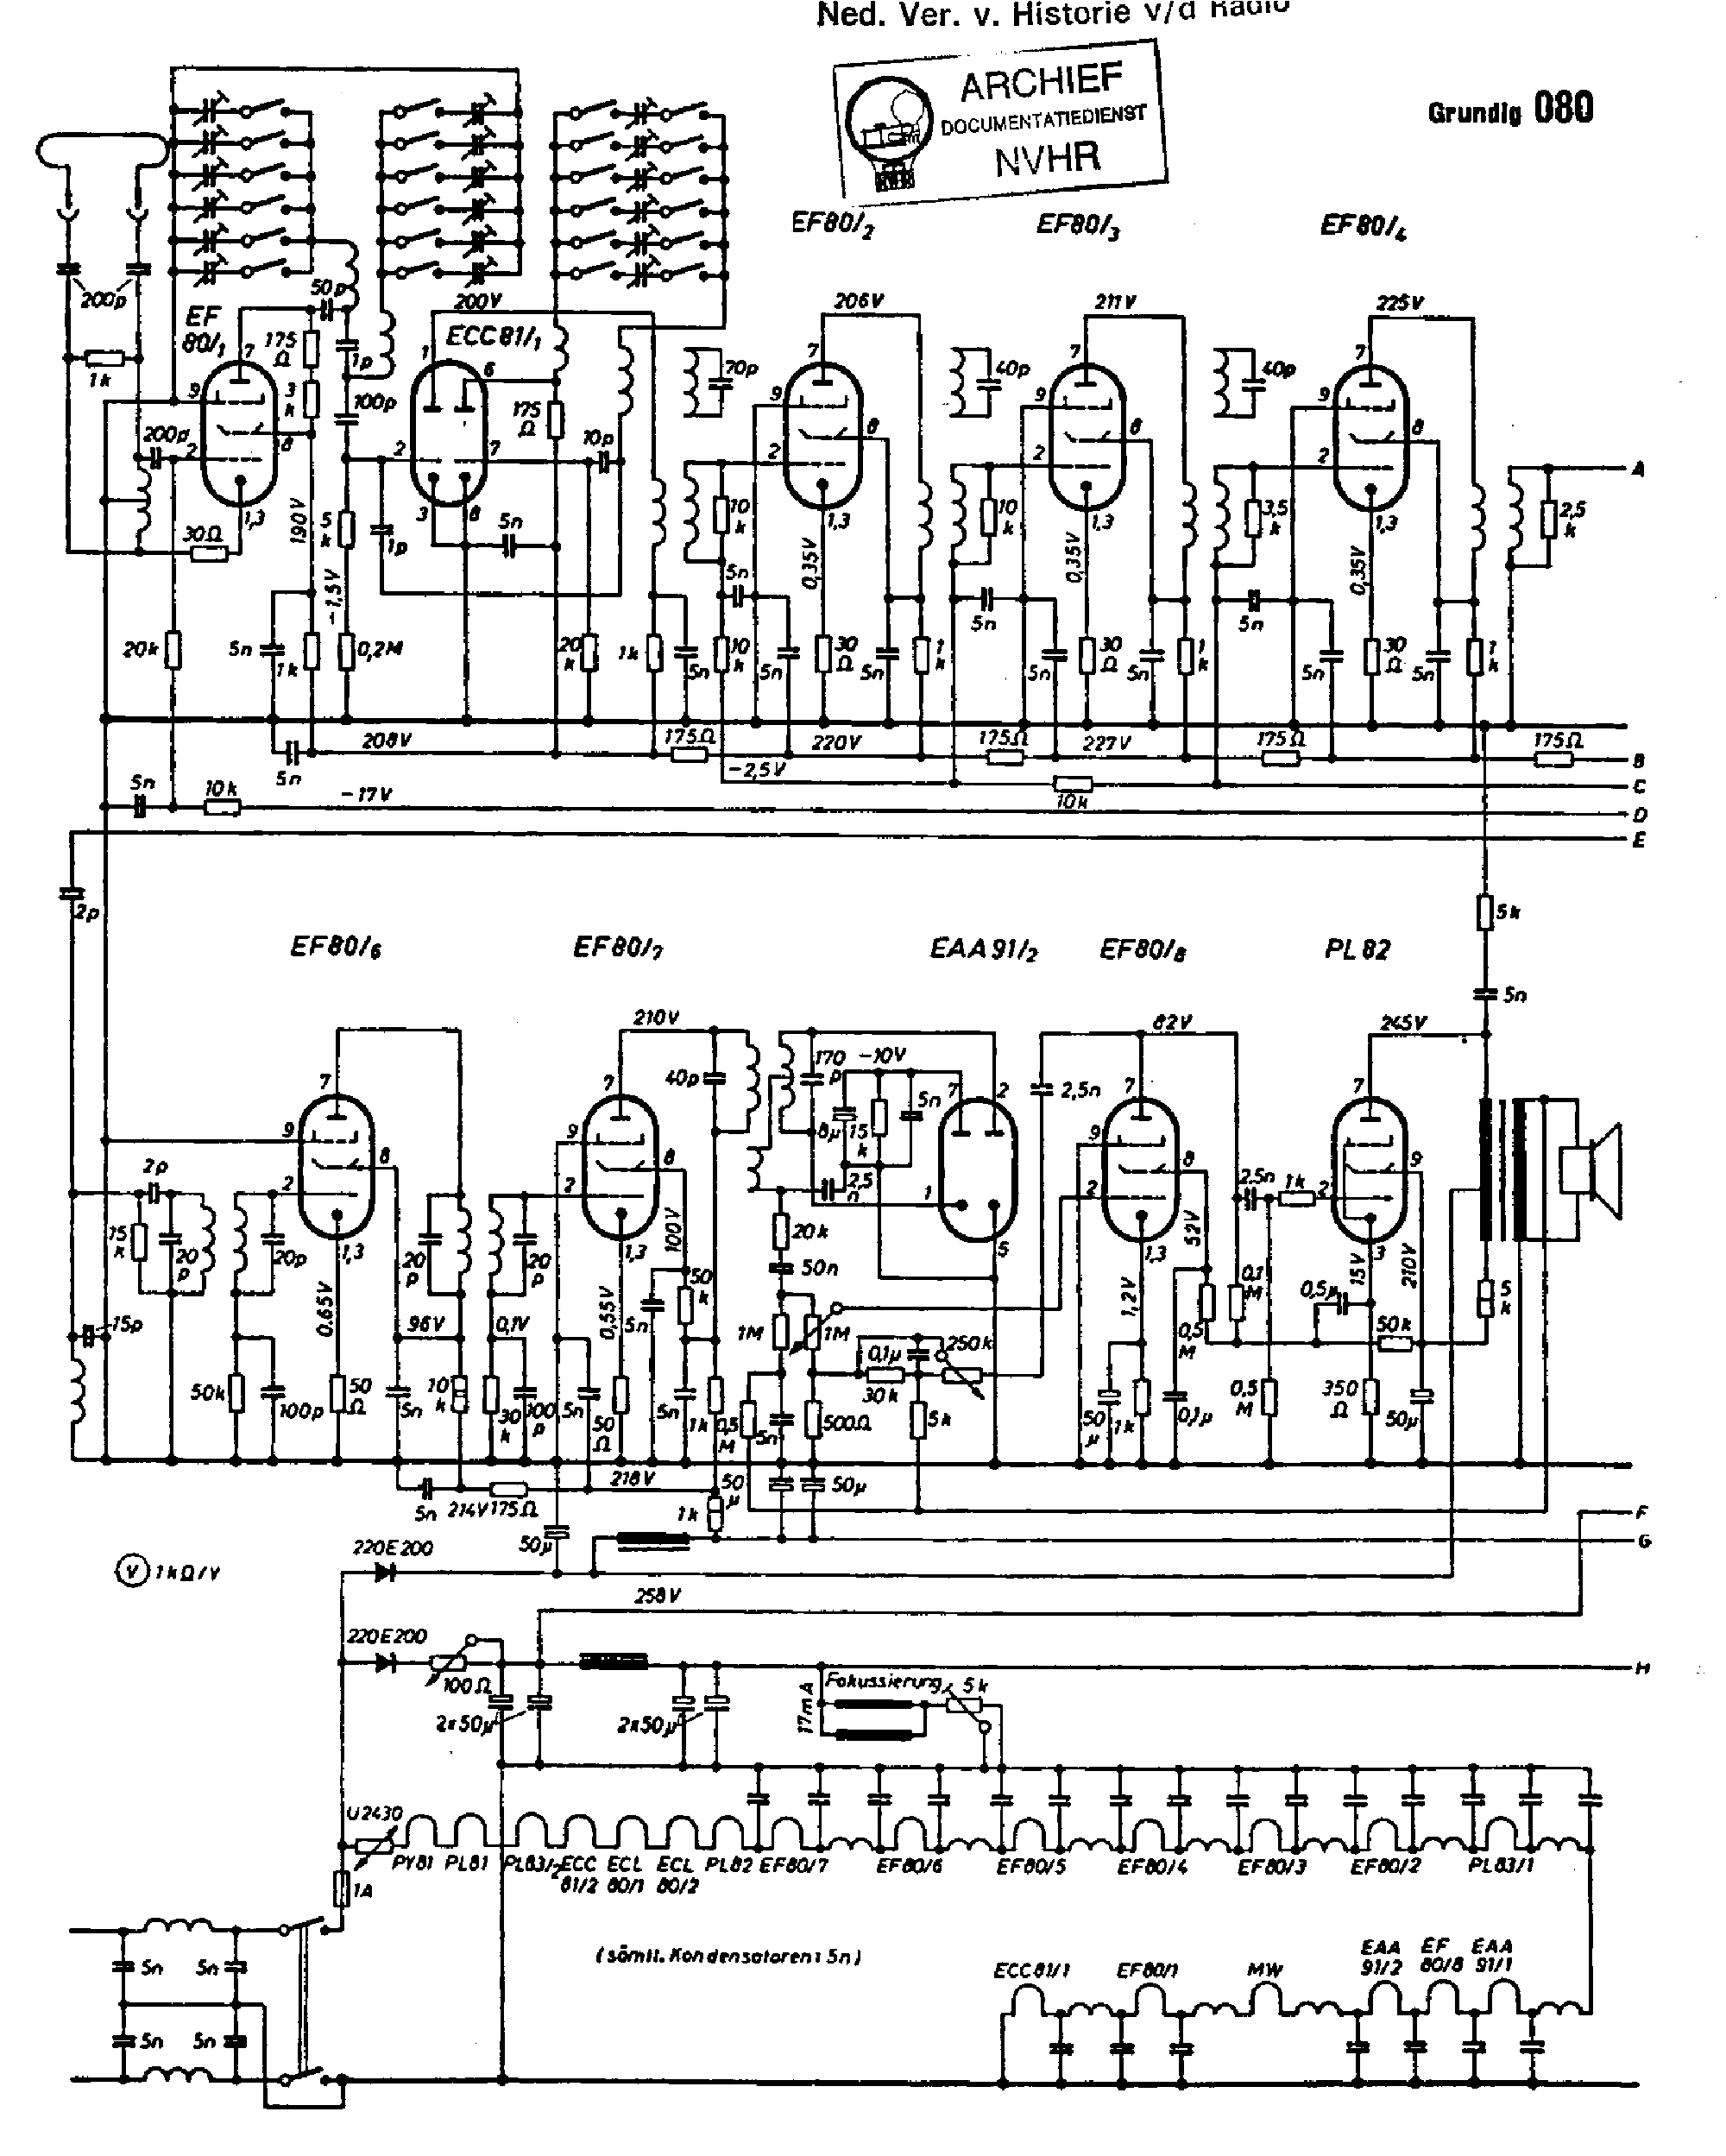 Grundig 080 Tv Receiver 1951 Sch Service Manual Download